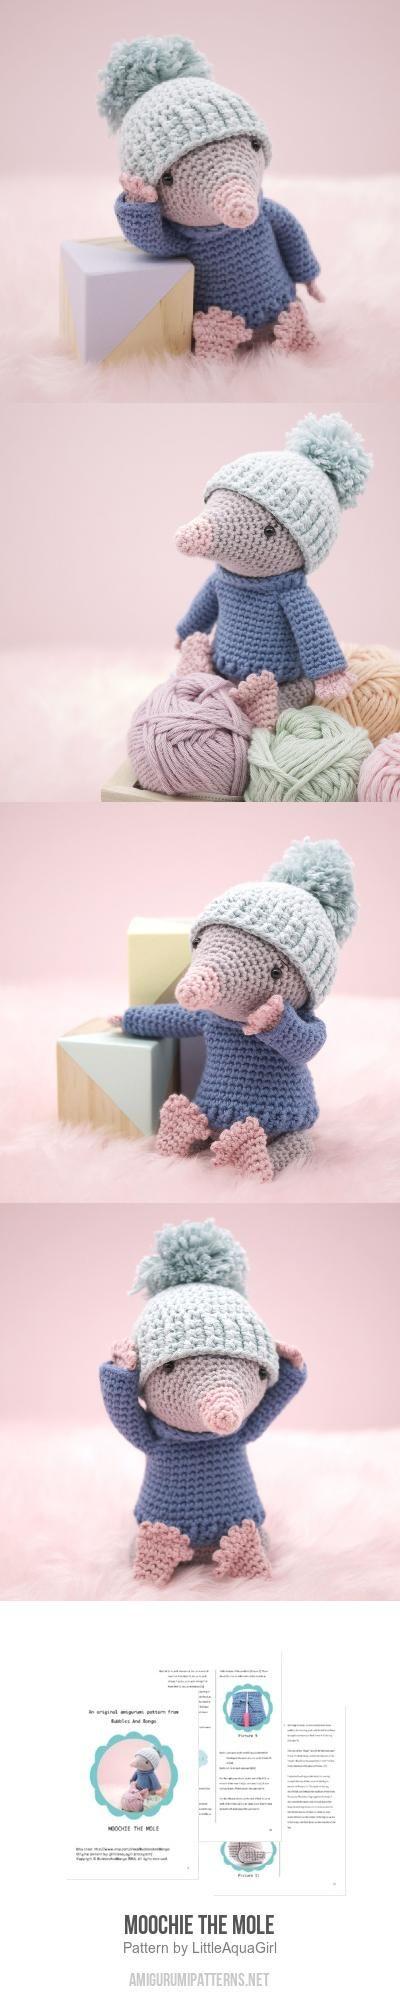 Moochie the Mole amigurumi pattern by LittleAquaGirl | Mole ...